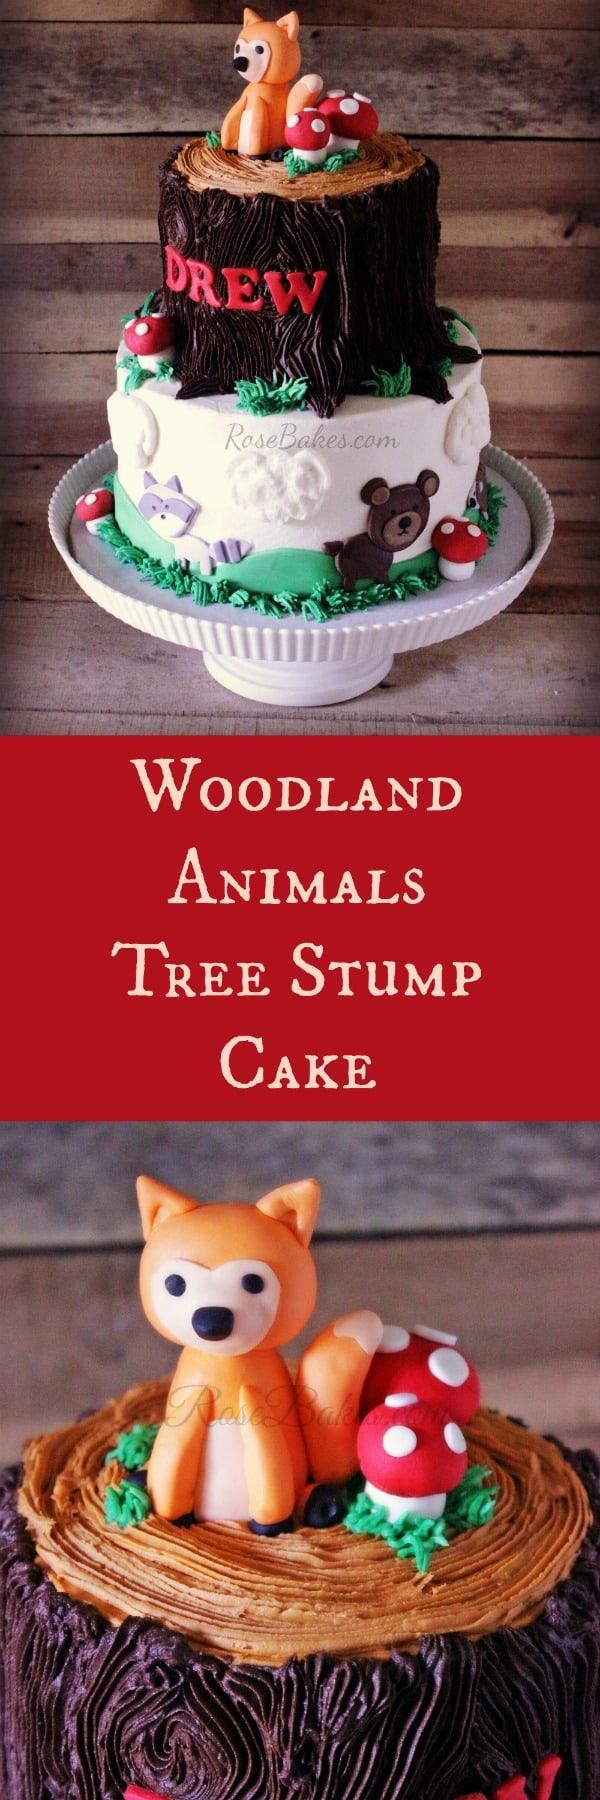 Woodland Animals Tree Stump Cake RoseBakes.com